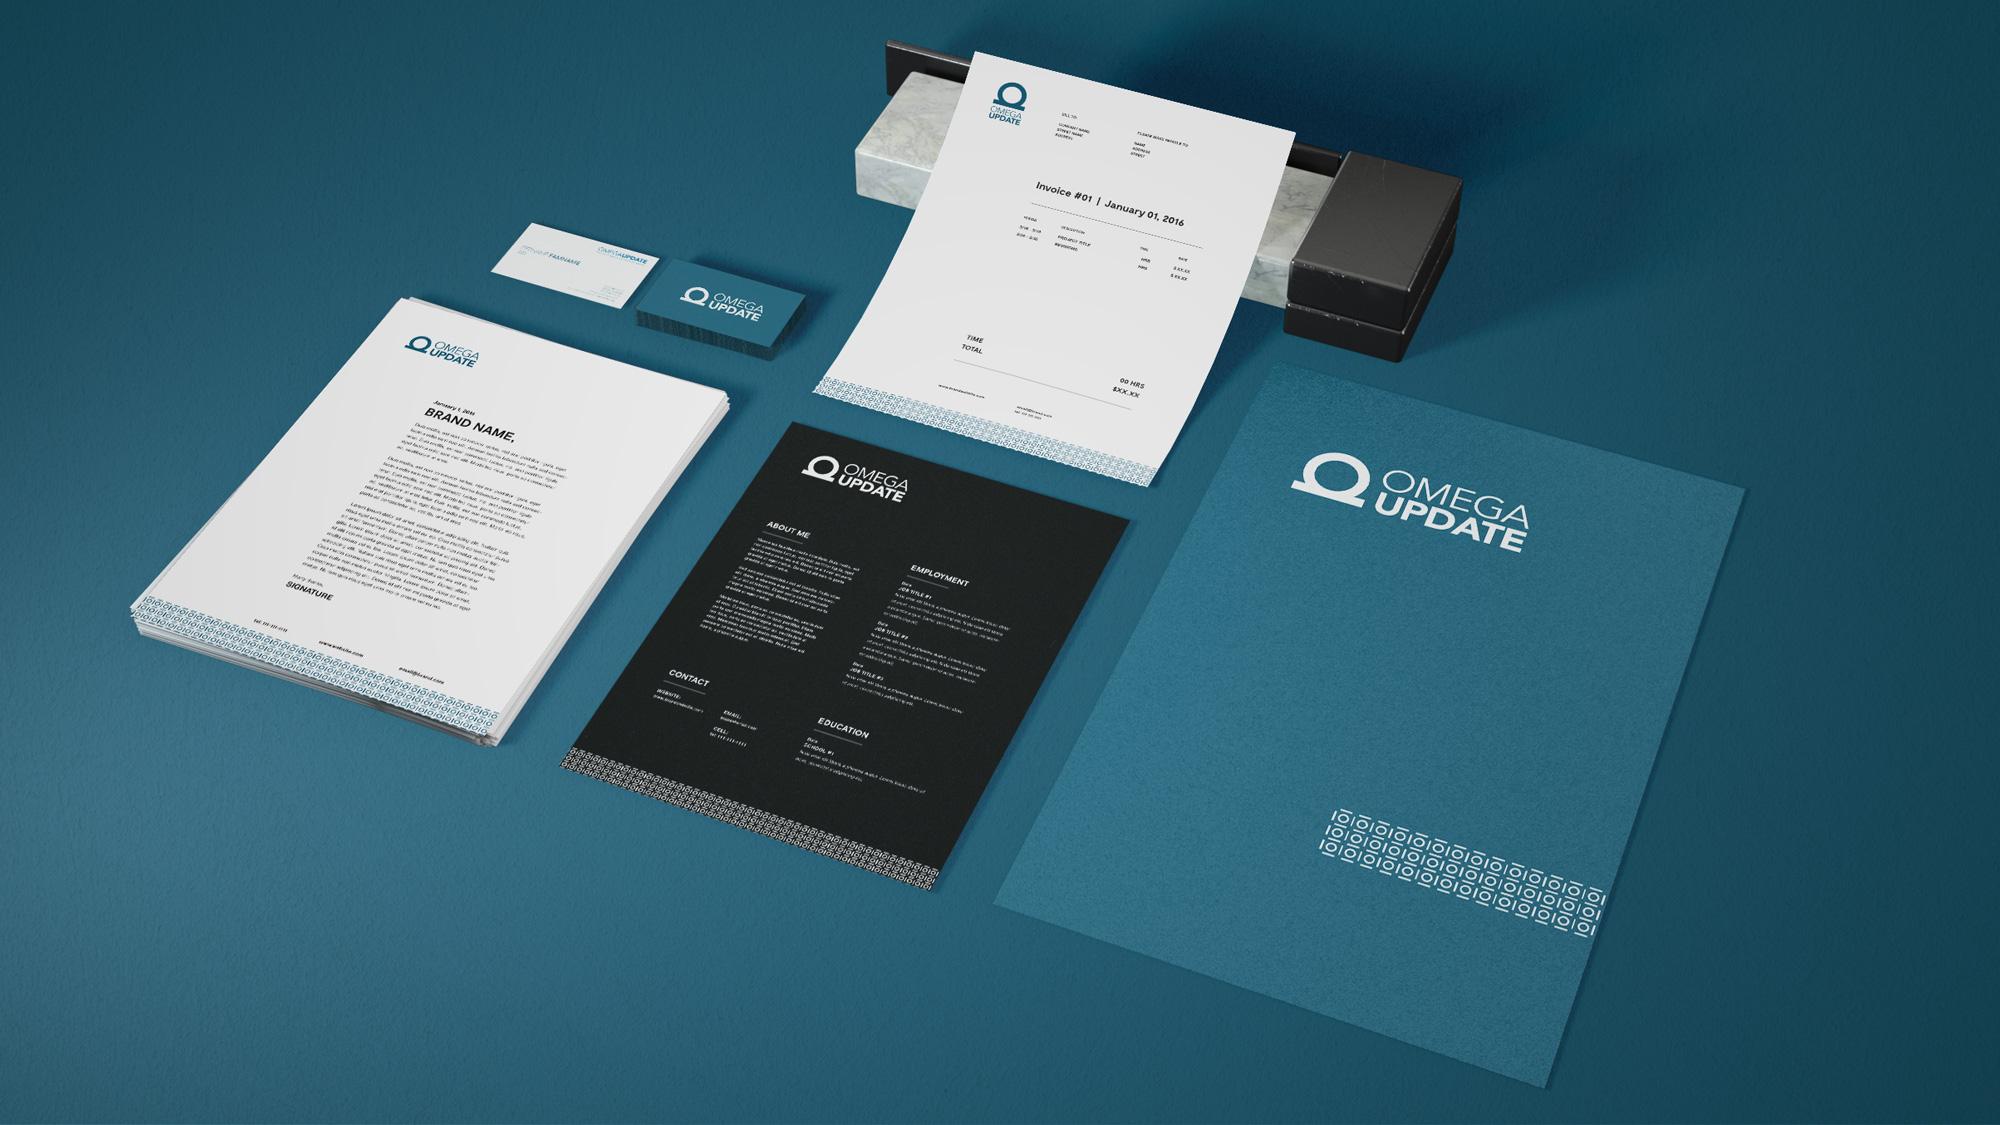 Omega Update stationery